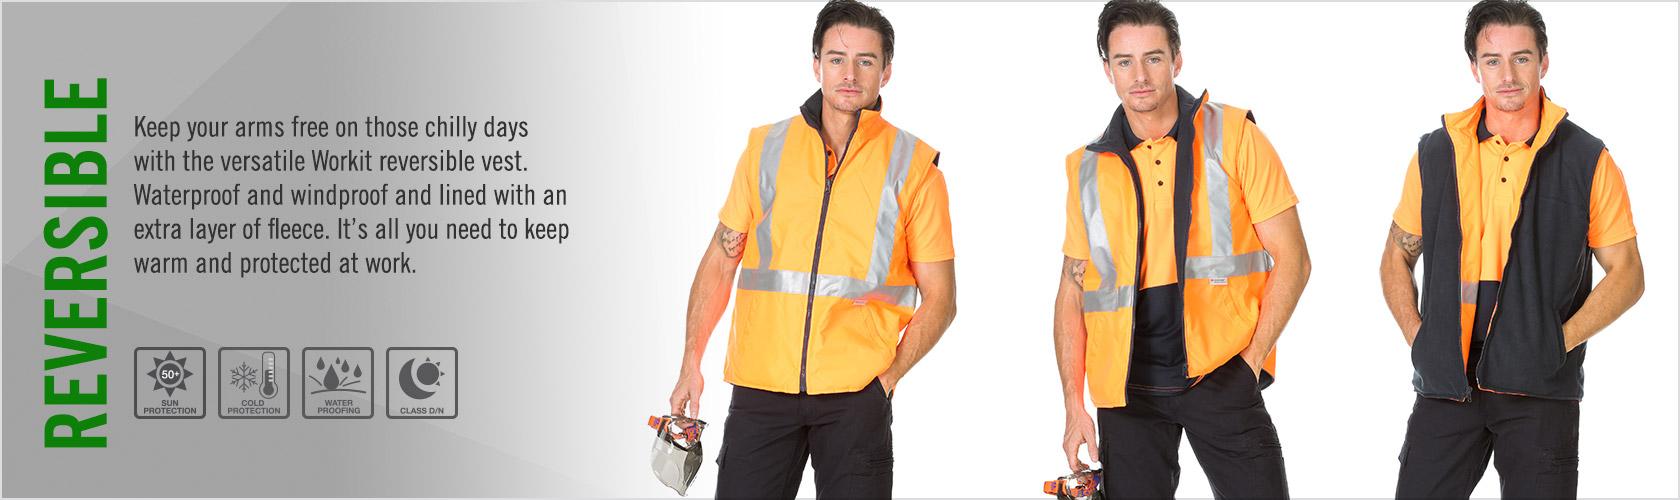 Cold & Wet Weather | WORKIT® Hi-Vis Reversible Vest with